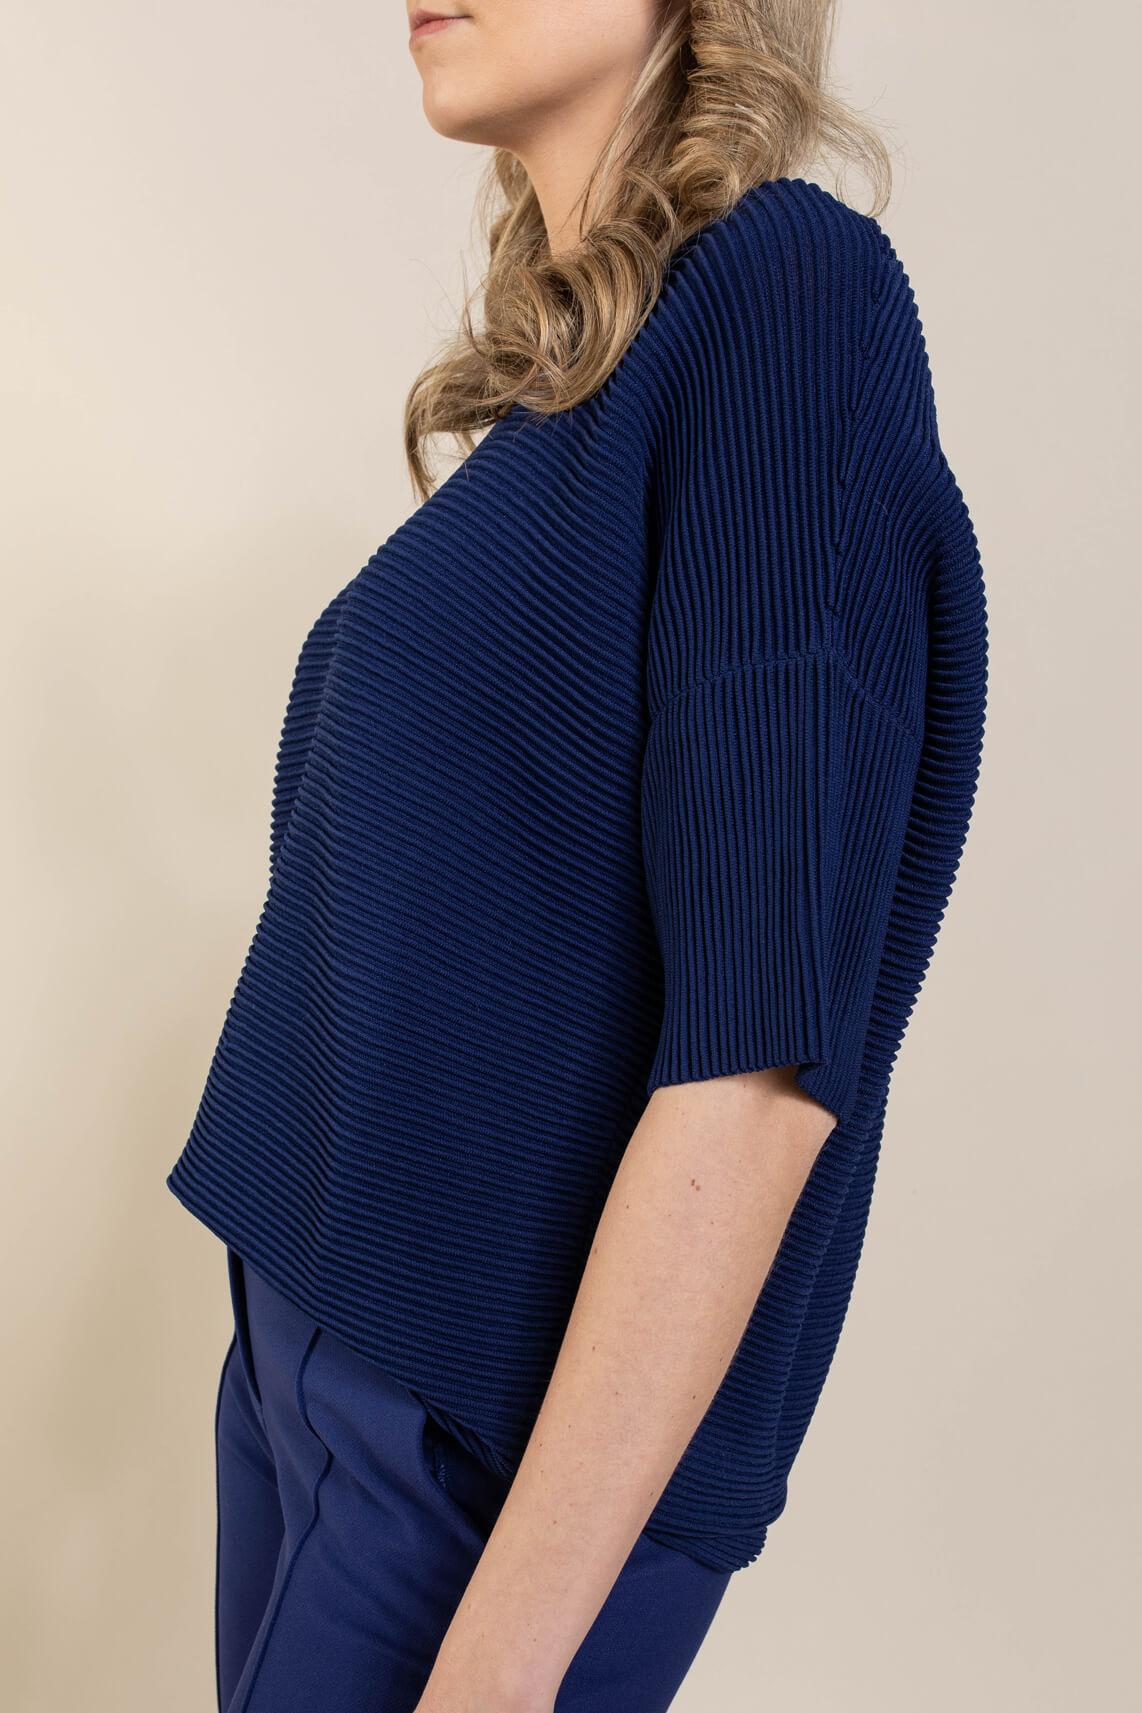 Riani Dames Pullover met ribstructuur Blauw